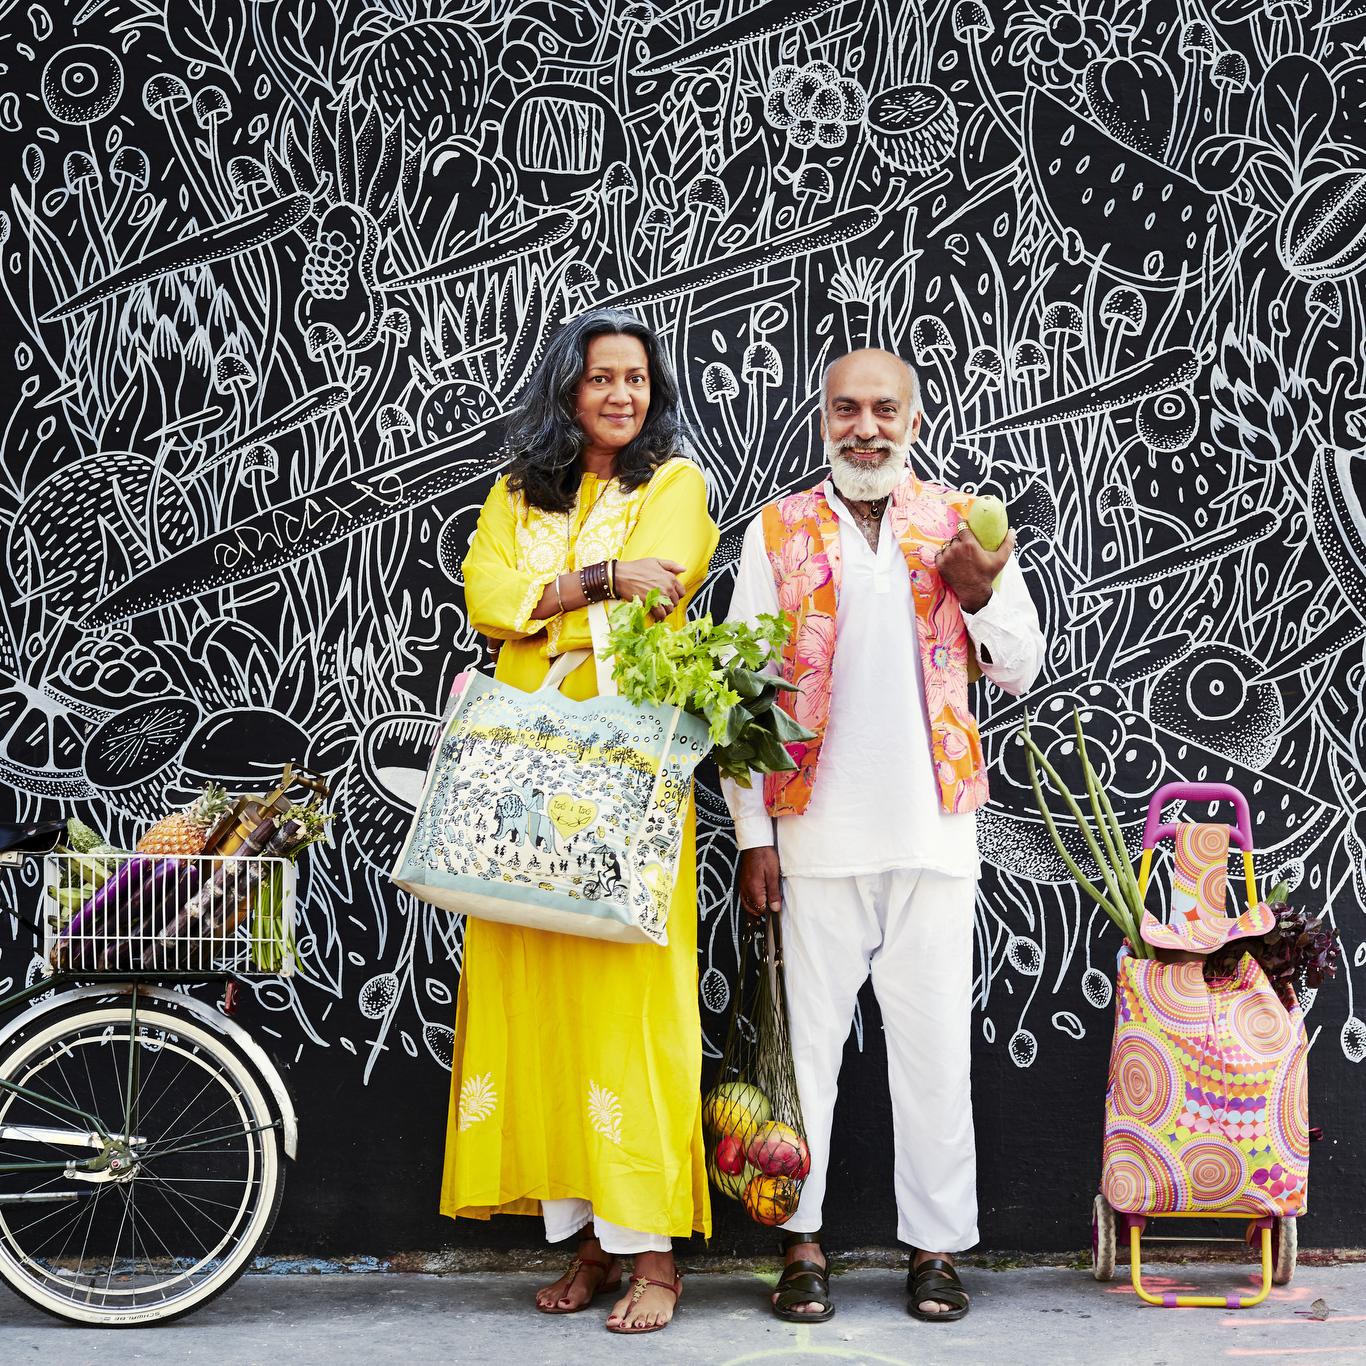 Marielou Phillips and Manish Arora